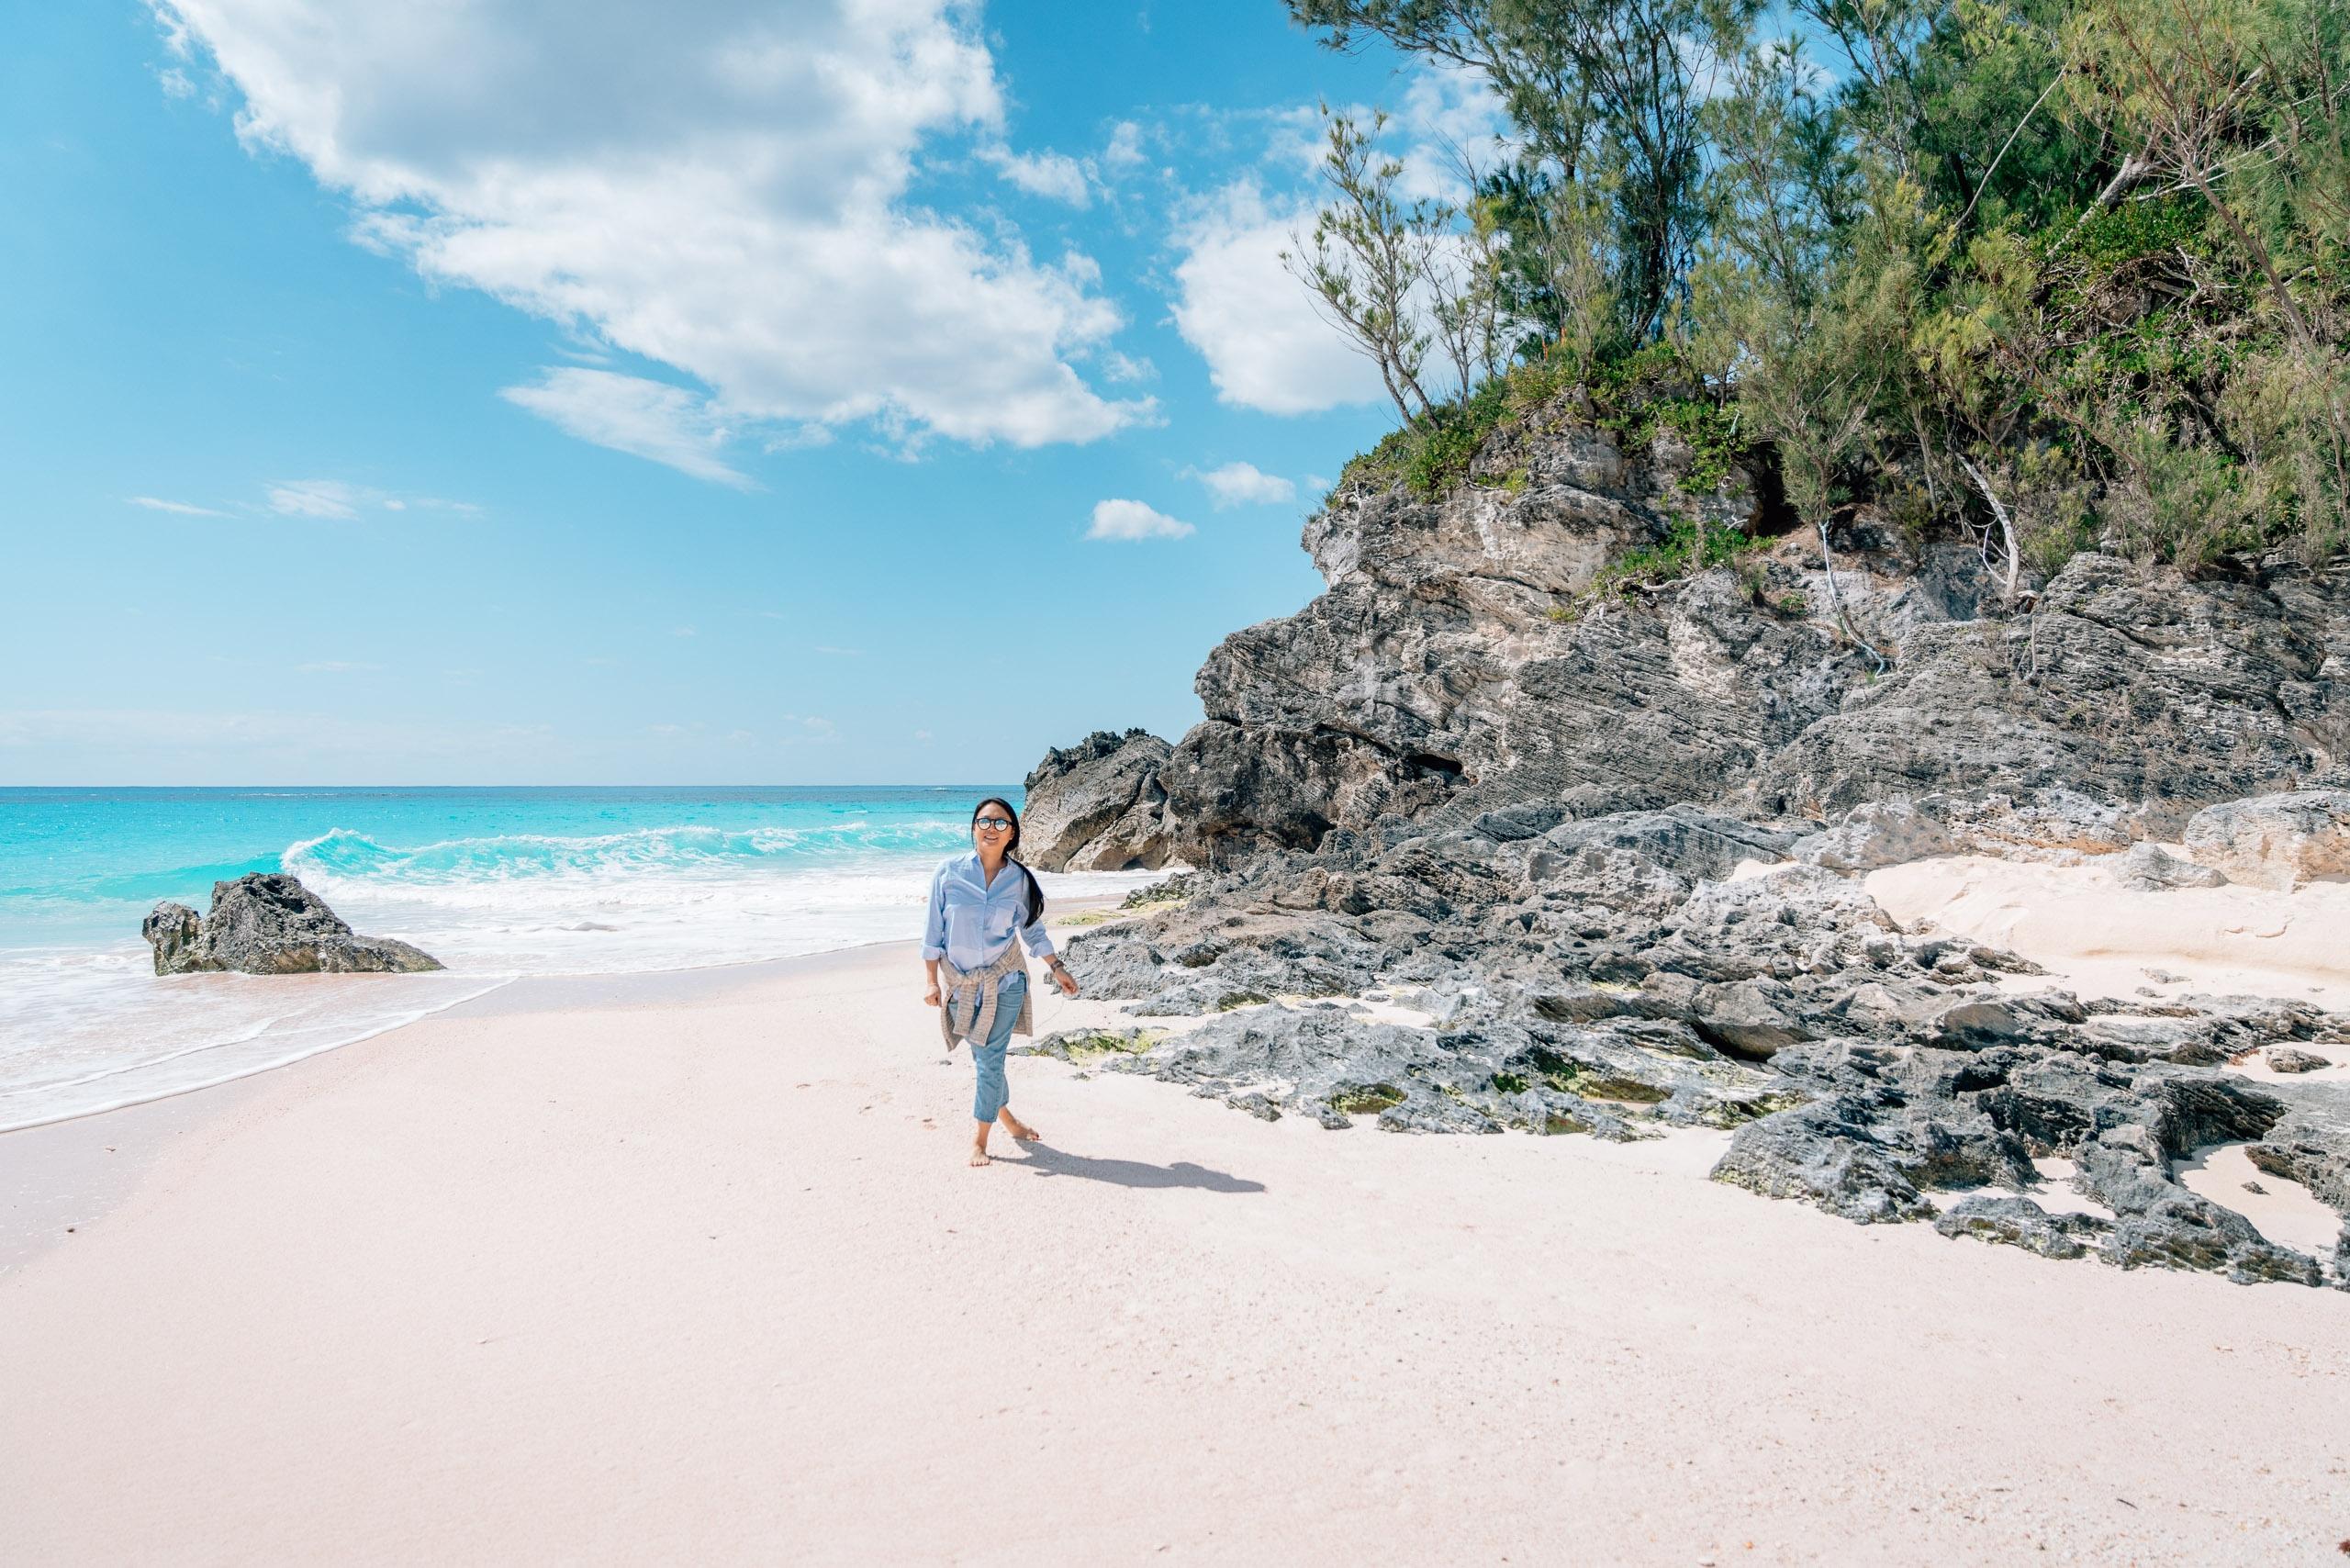 The Tucker's Beach Club at the Rosewood Bermuda